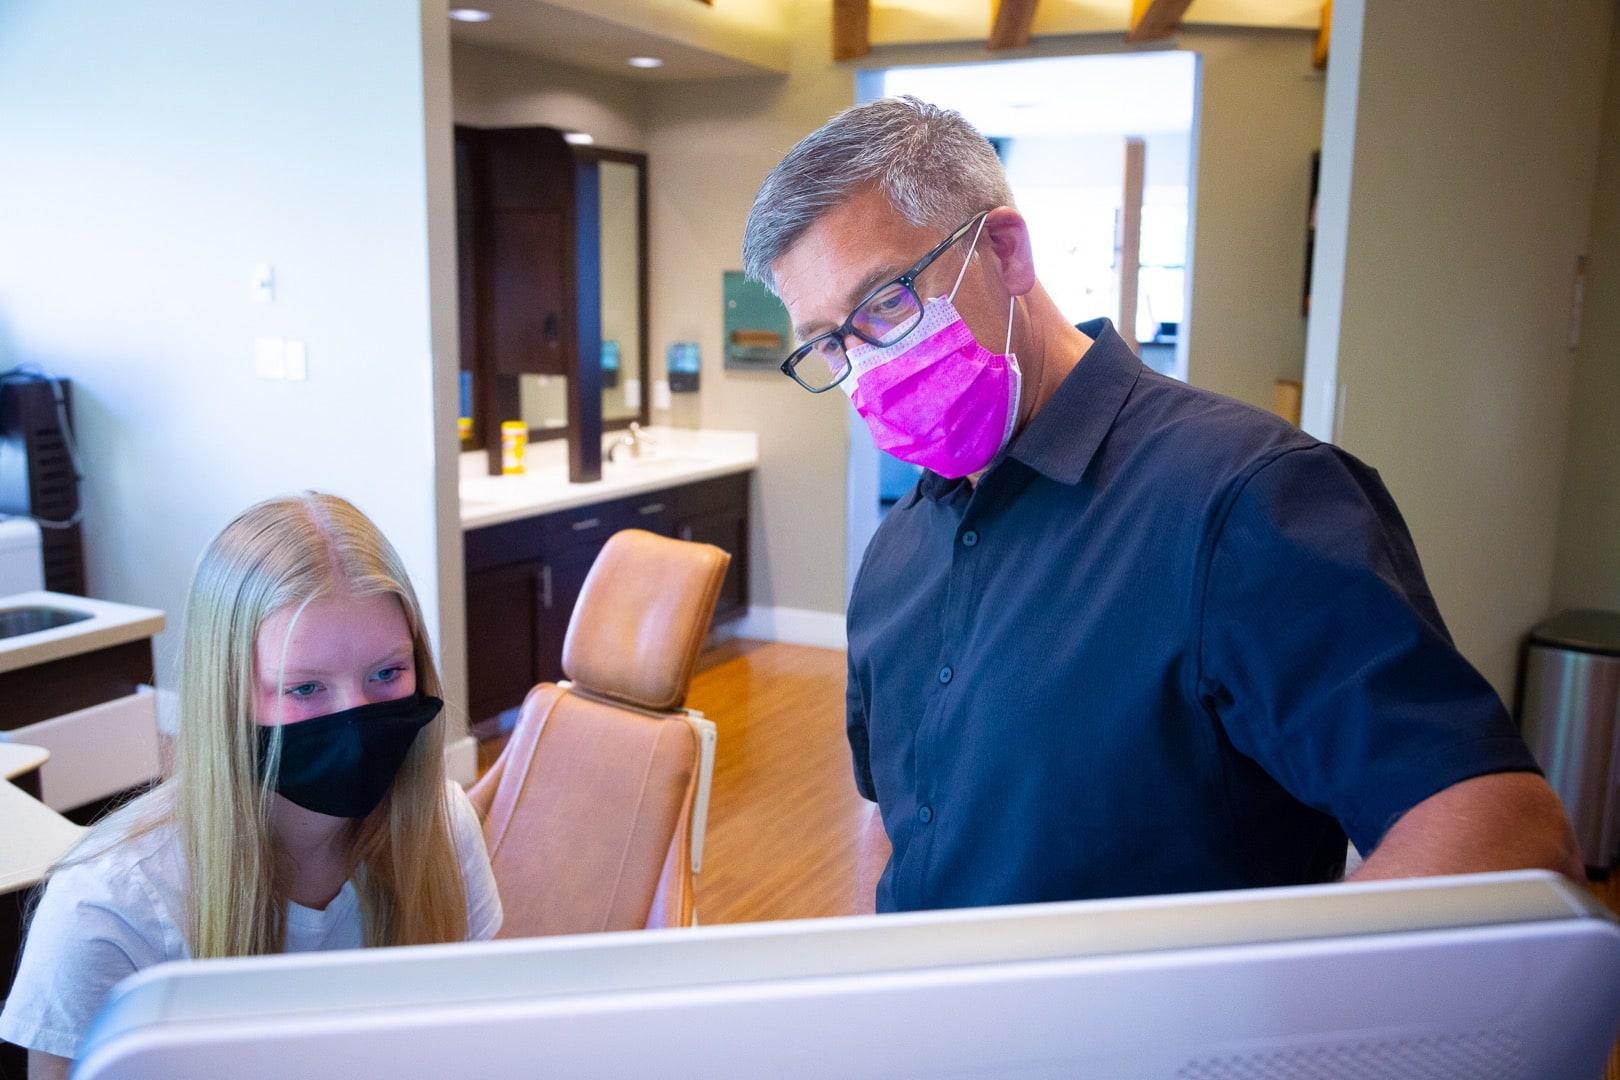 Doctor Candids Oceans Edge Orthodontics 2020 Nanaimo Canada Orthodontist 22 - Meet Dr. Murdoch